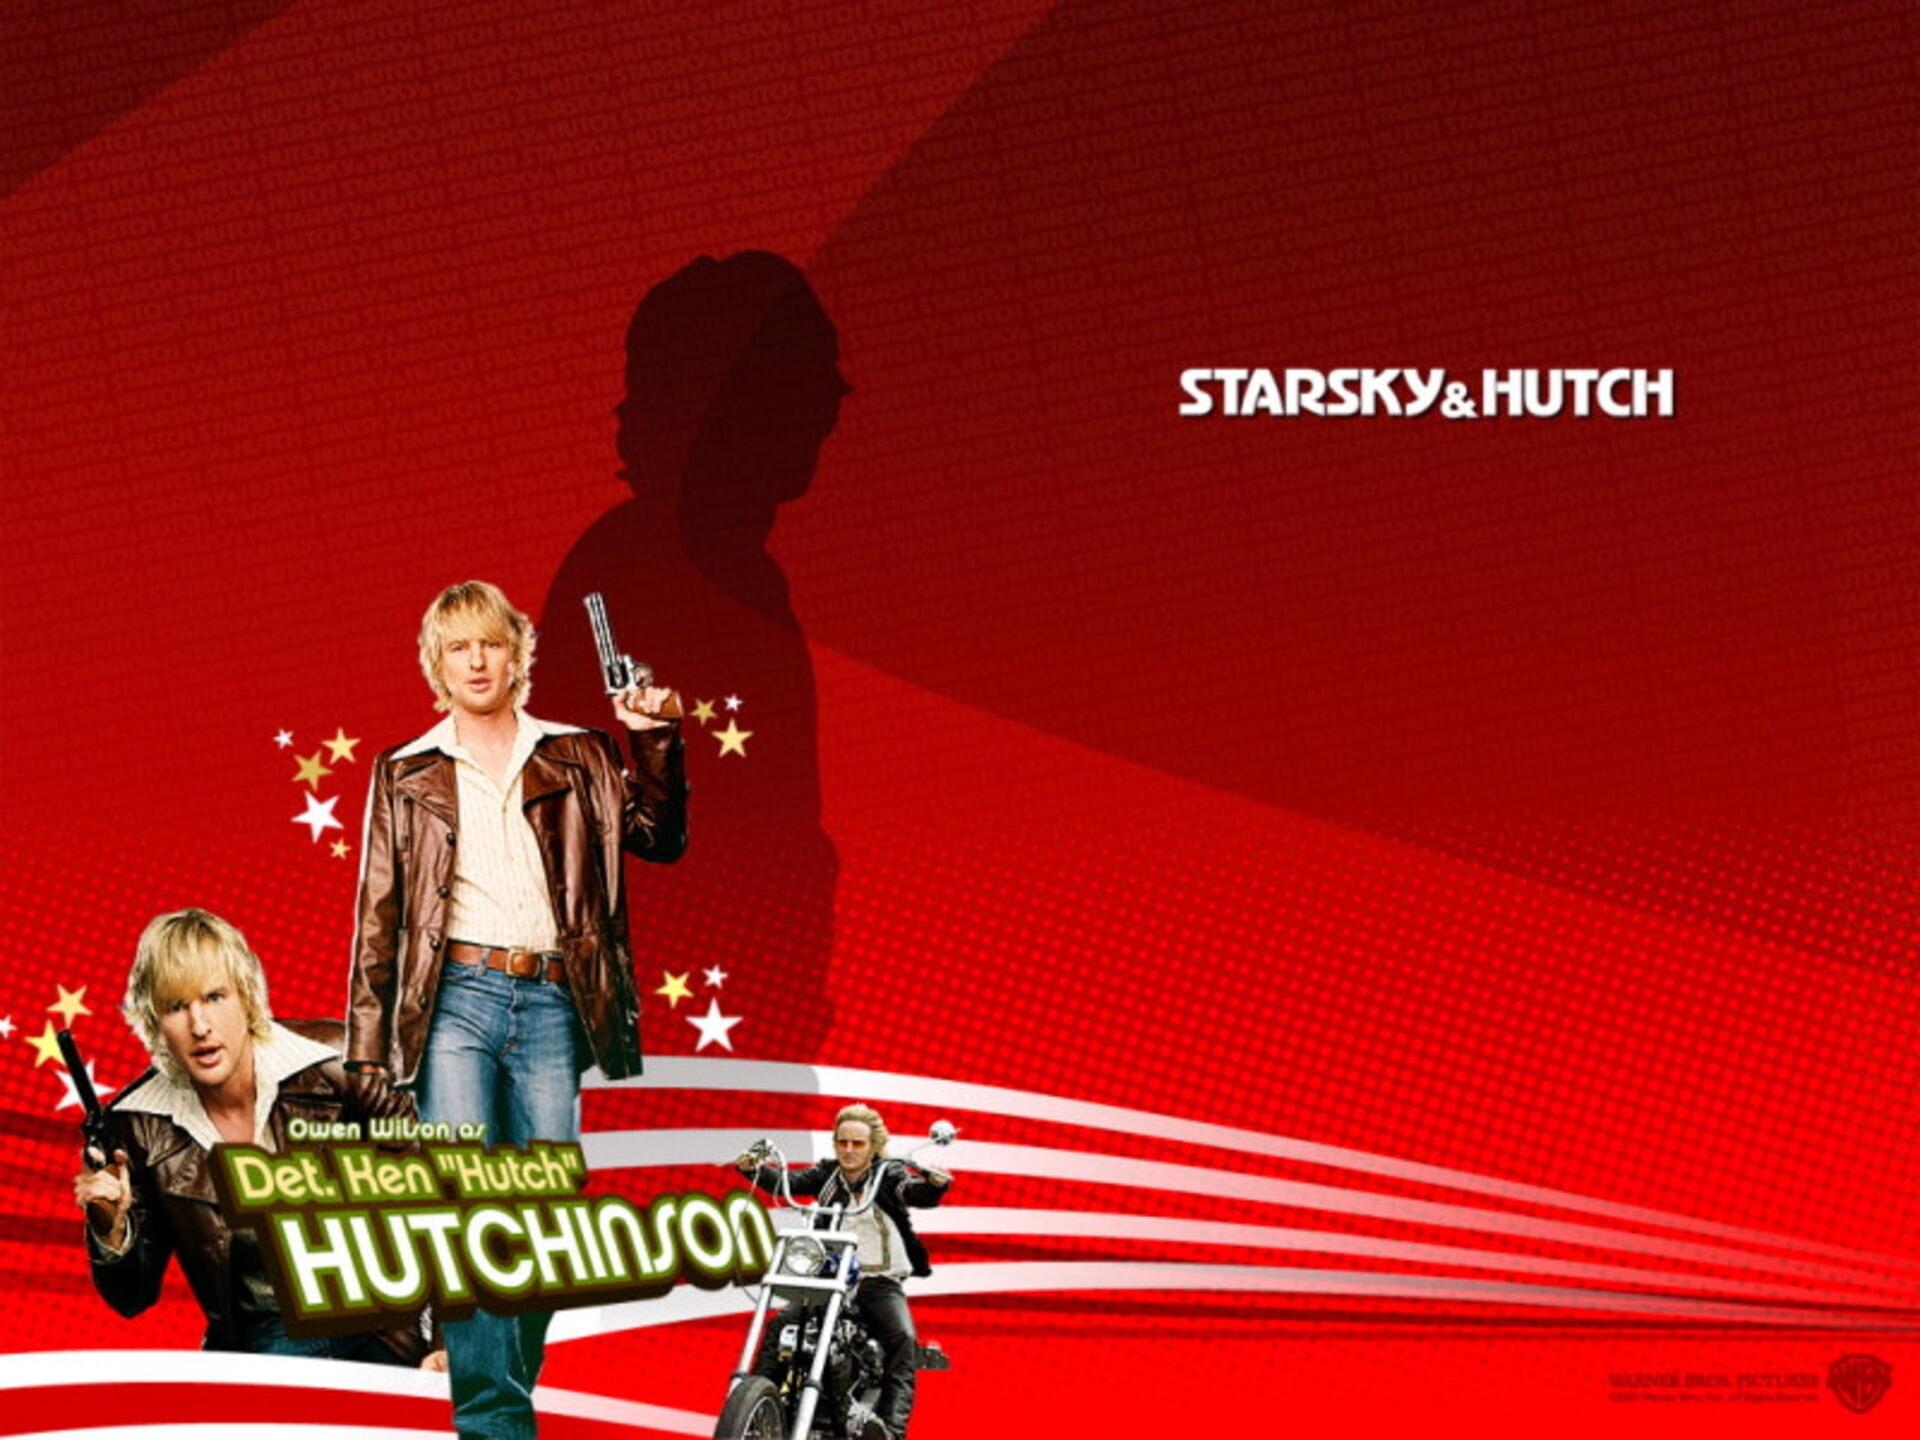 Starsky & Hutch - Poster 2